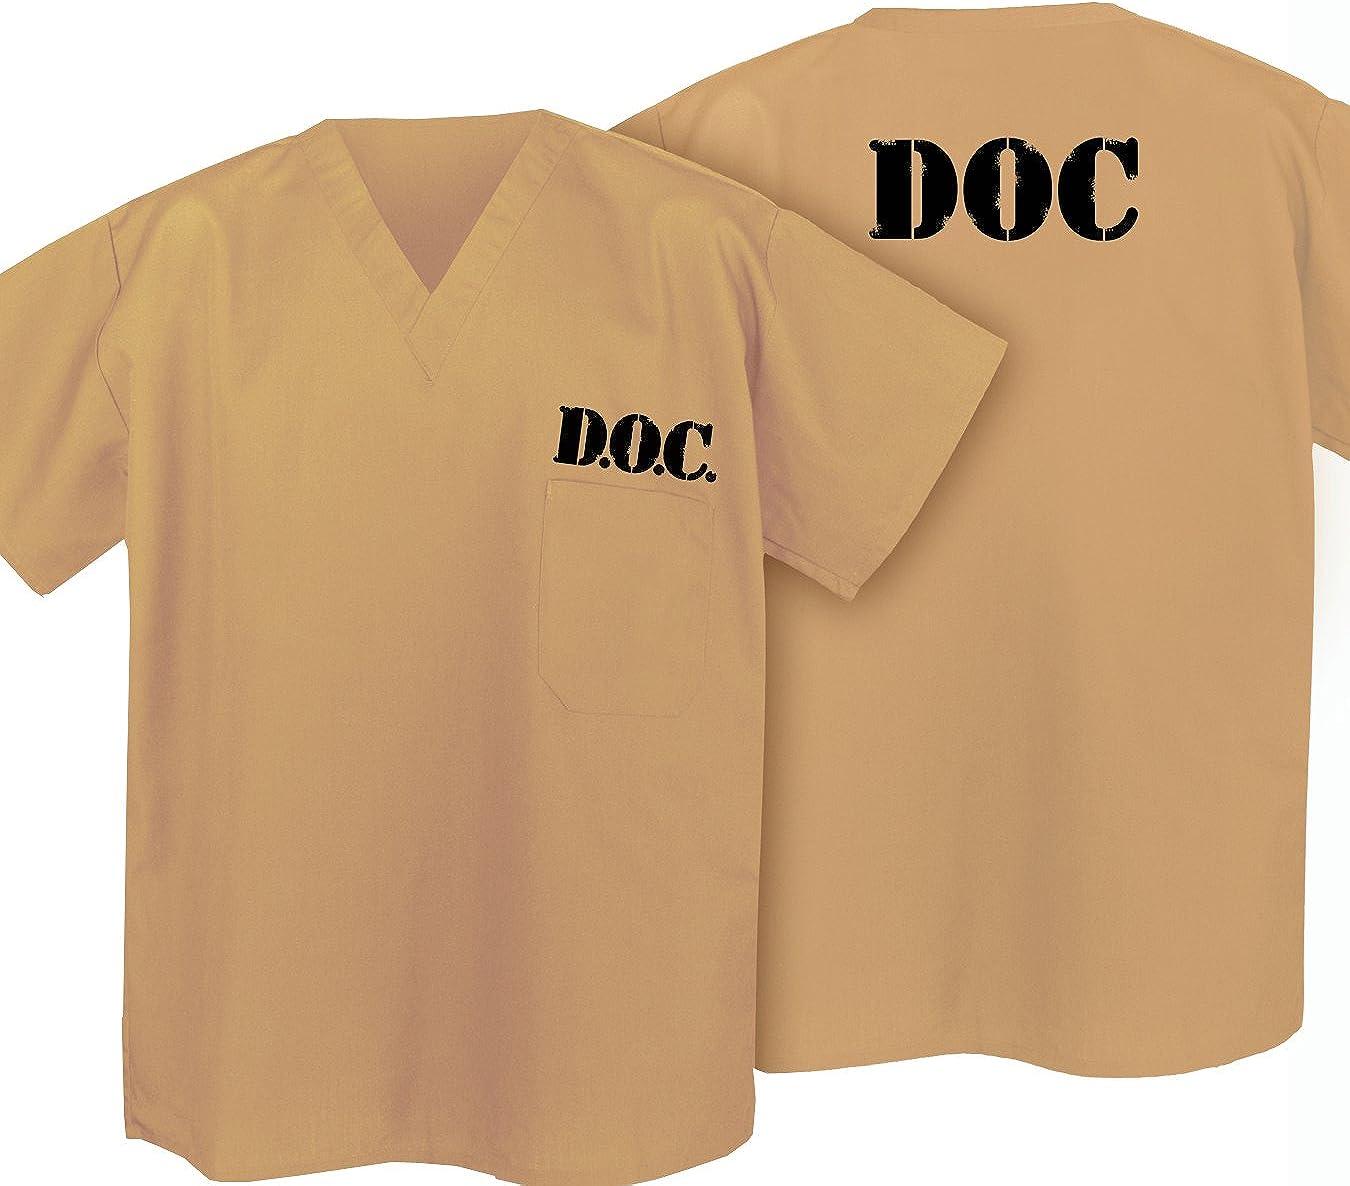 TAN SCRUBS TOPS SHIRT SCRUB Khaki SHIRTS great Costume JAIL or Prison Uniform